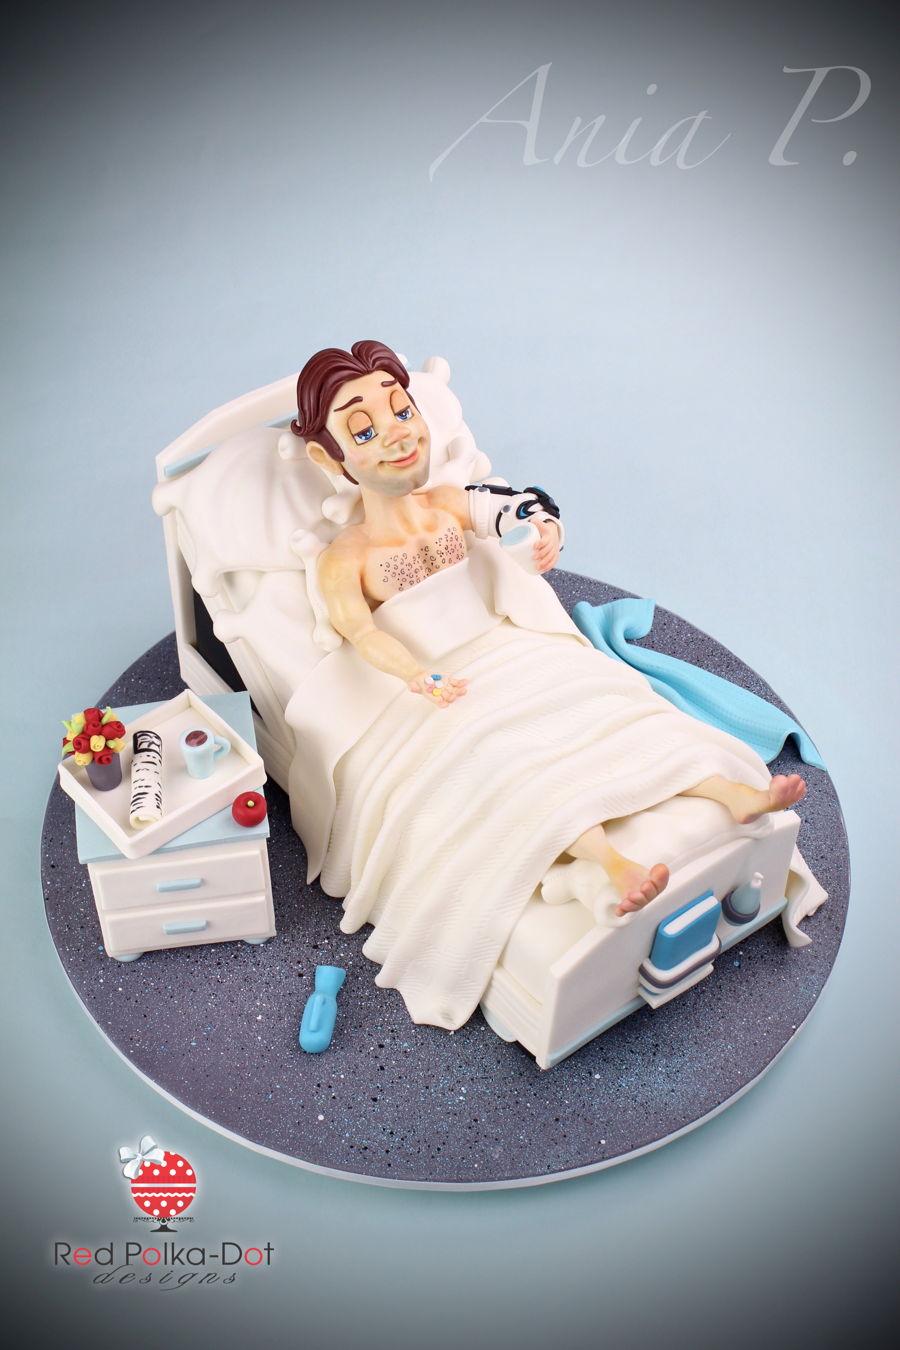 Hospital Bed Cake Cakecentral Com